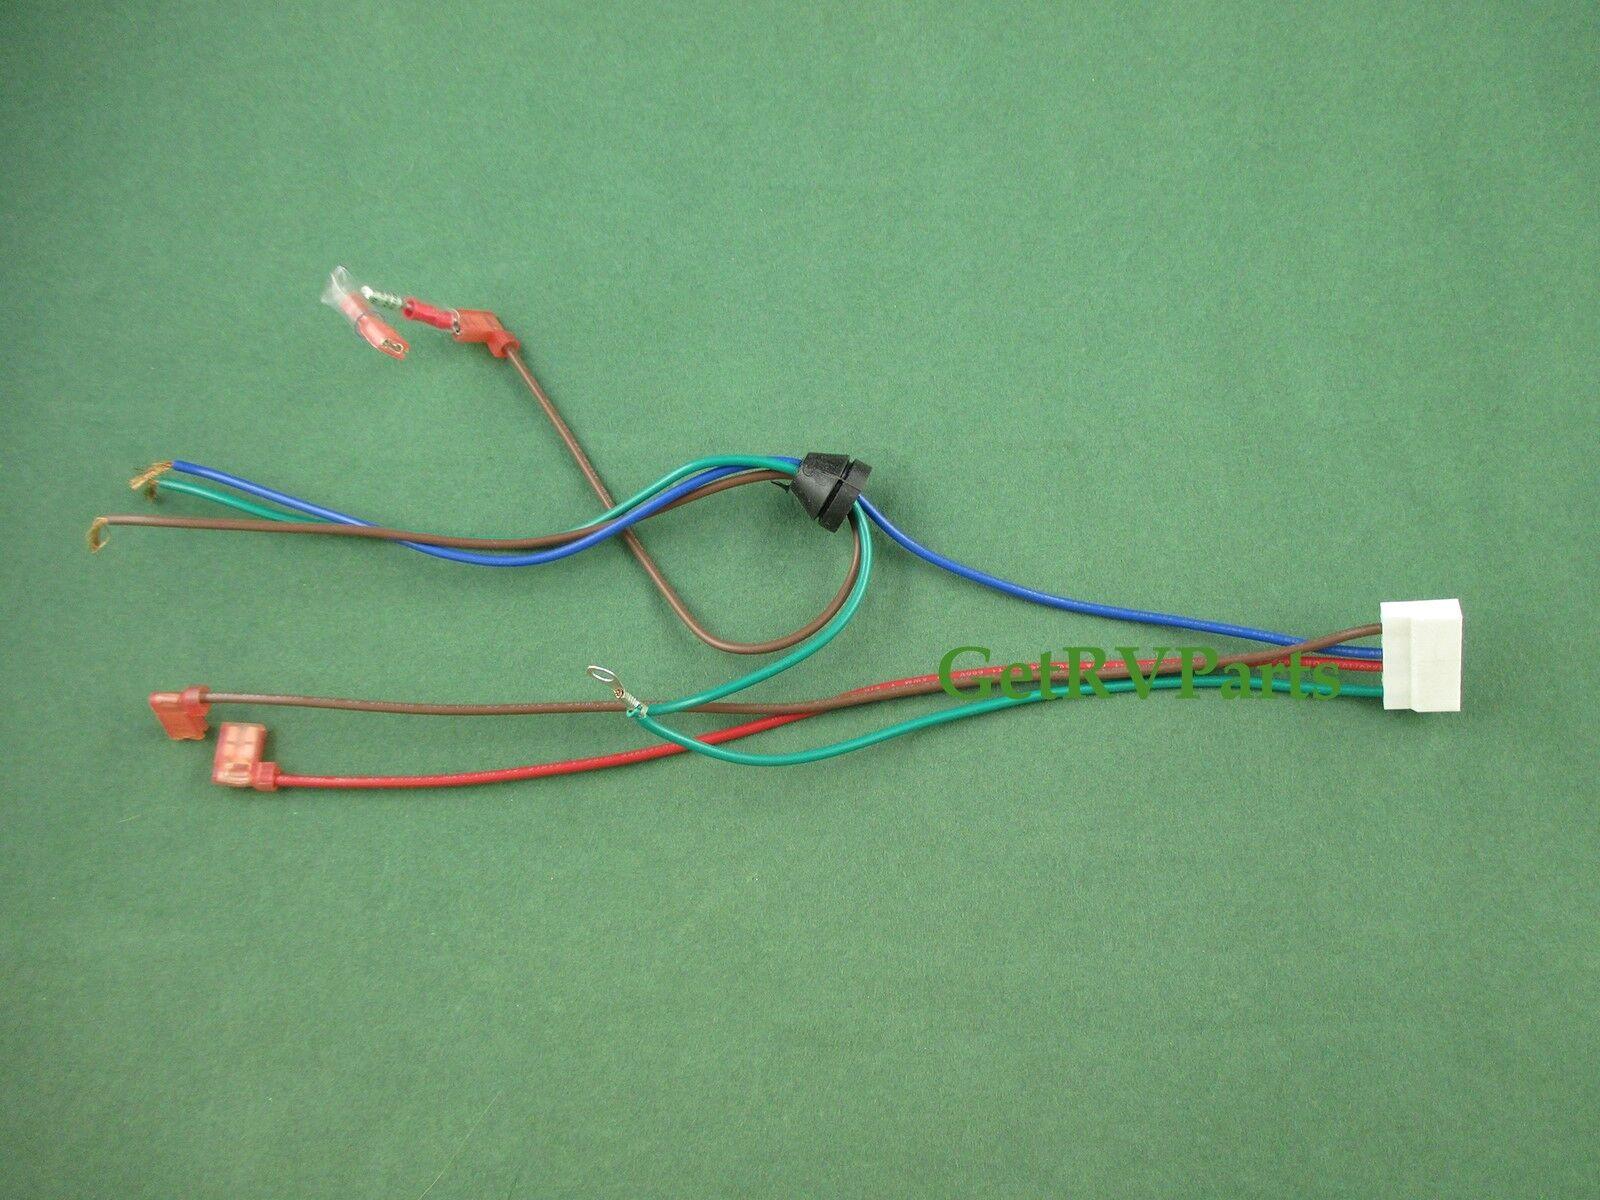 $_57?set_id\\\=880000500F truck camper wire harness wiring diagrams forbiddendoctor org truck camper wire harness at metegol.co